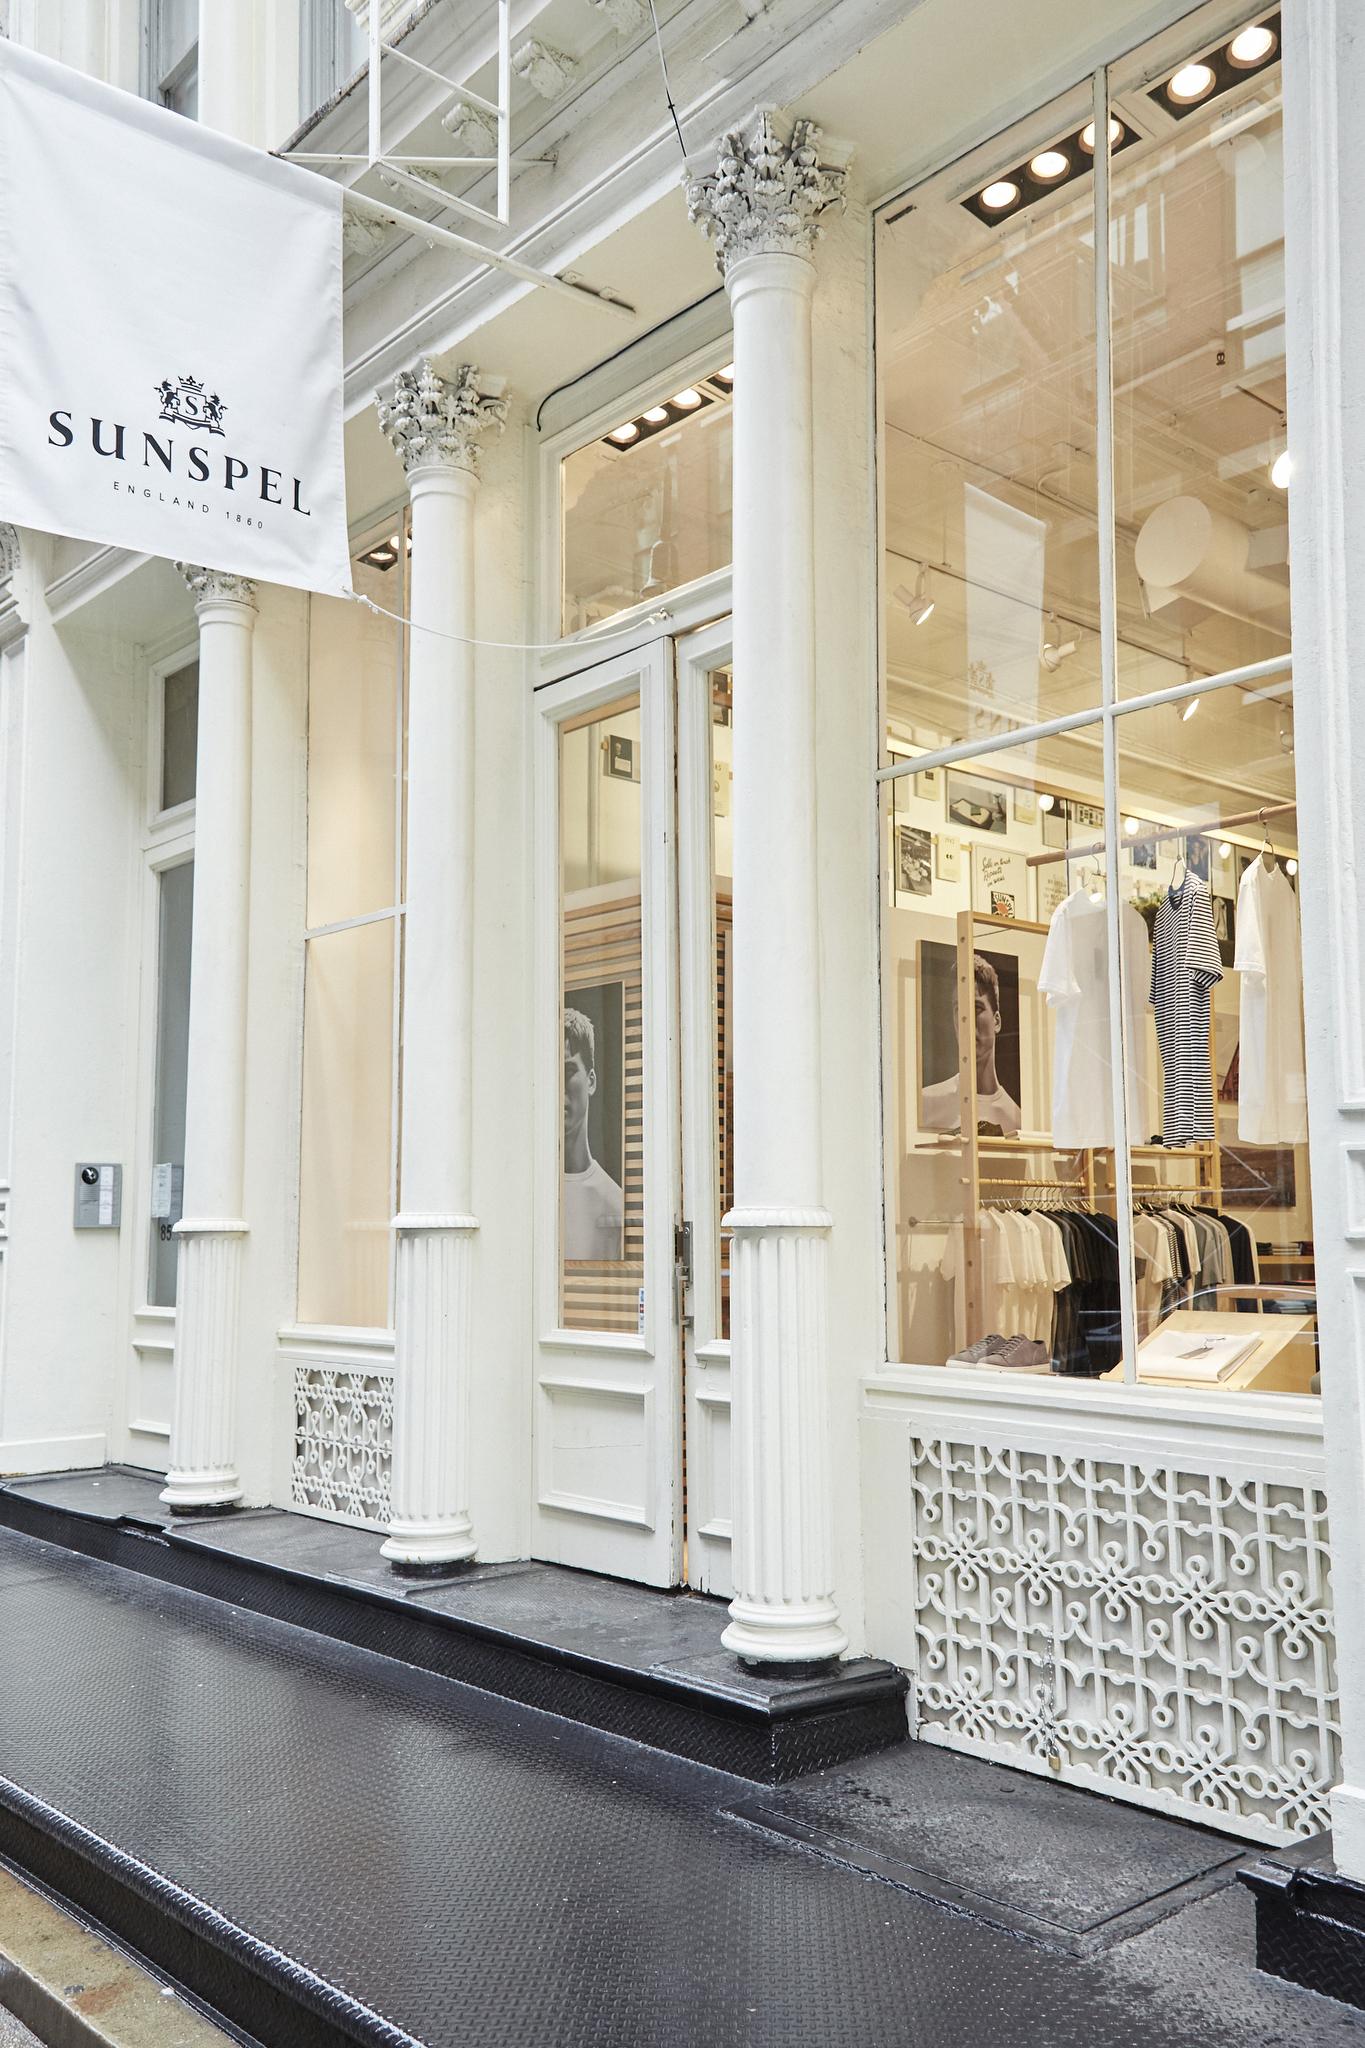 Sunspel's first U.S. store in New York's SoHo.